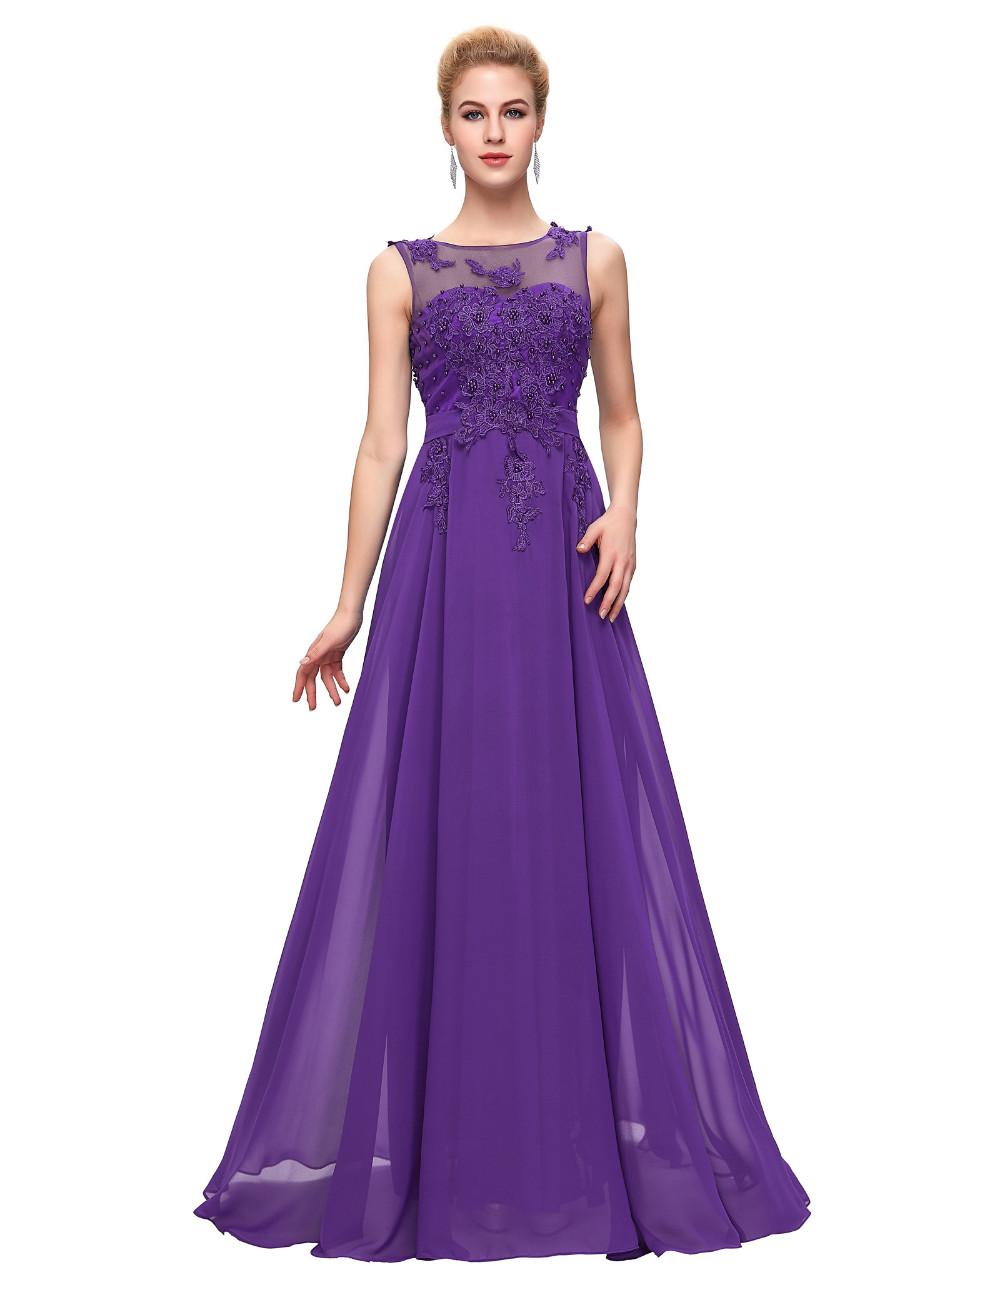 Grace Karin Elegant Long Evening Dresses 2016 Chiffon Pink Purple Red Royal Blue Black Formal Evening Dress Gown Abendkleider 33